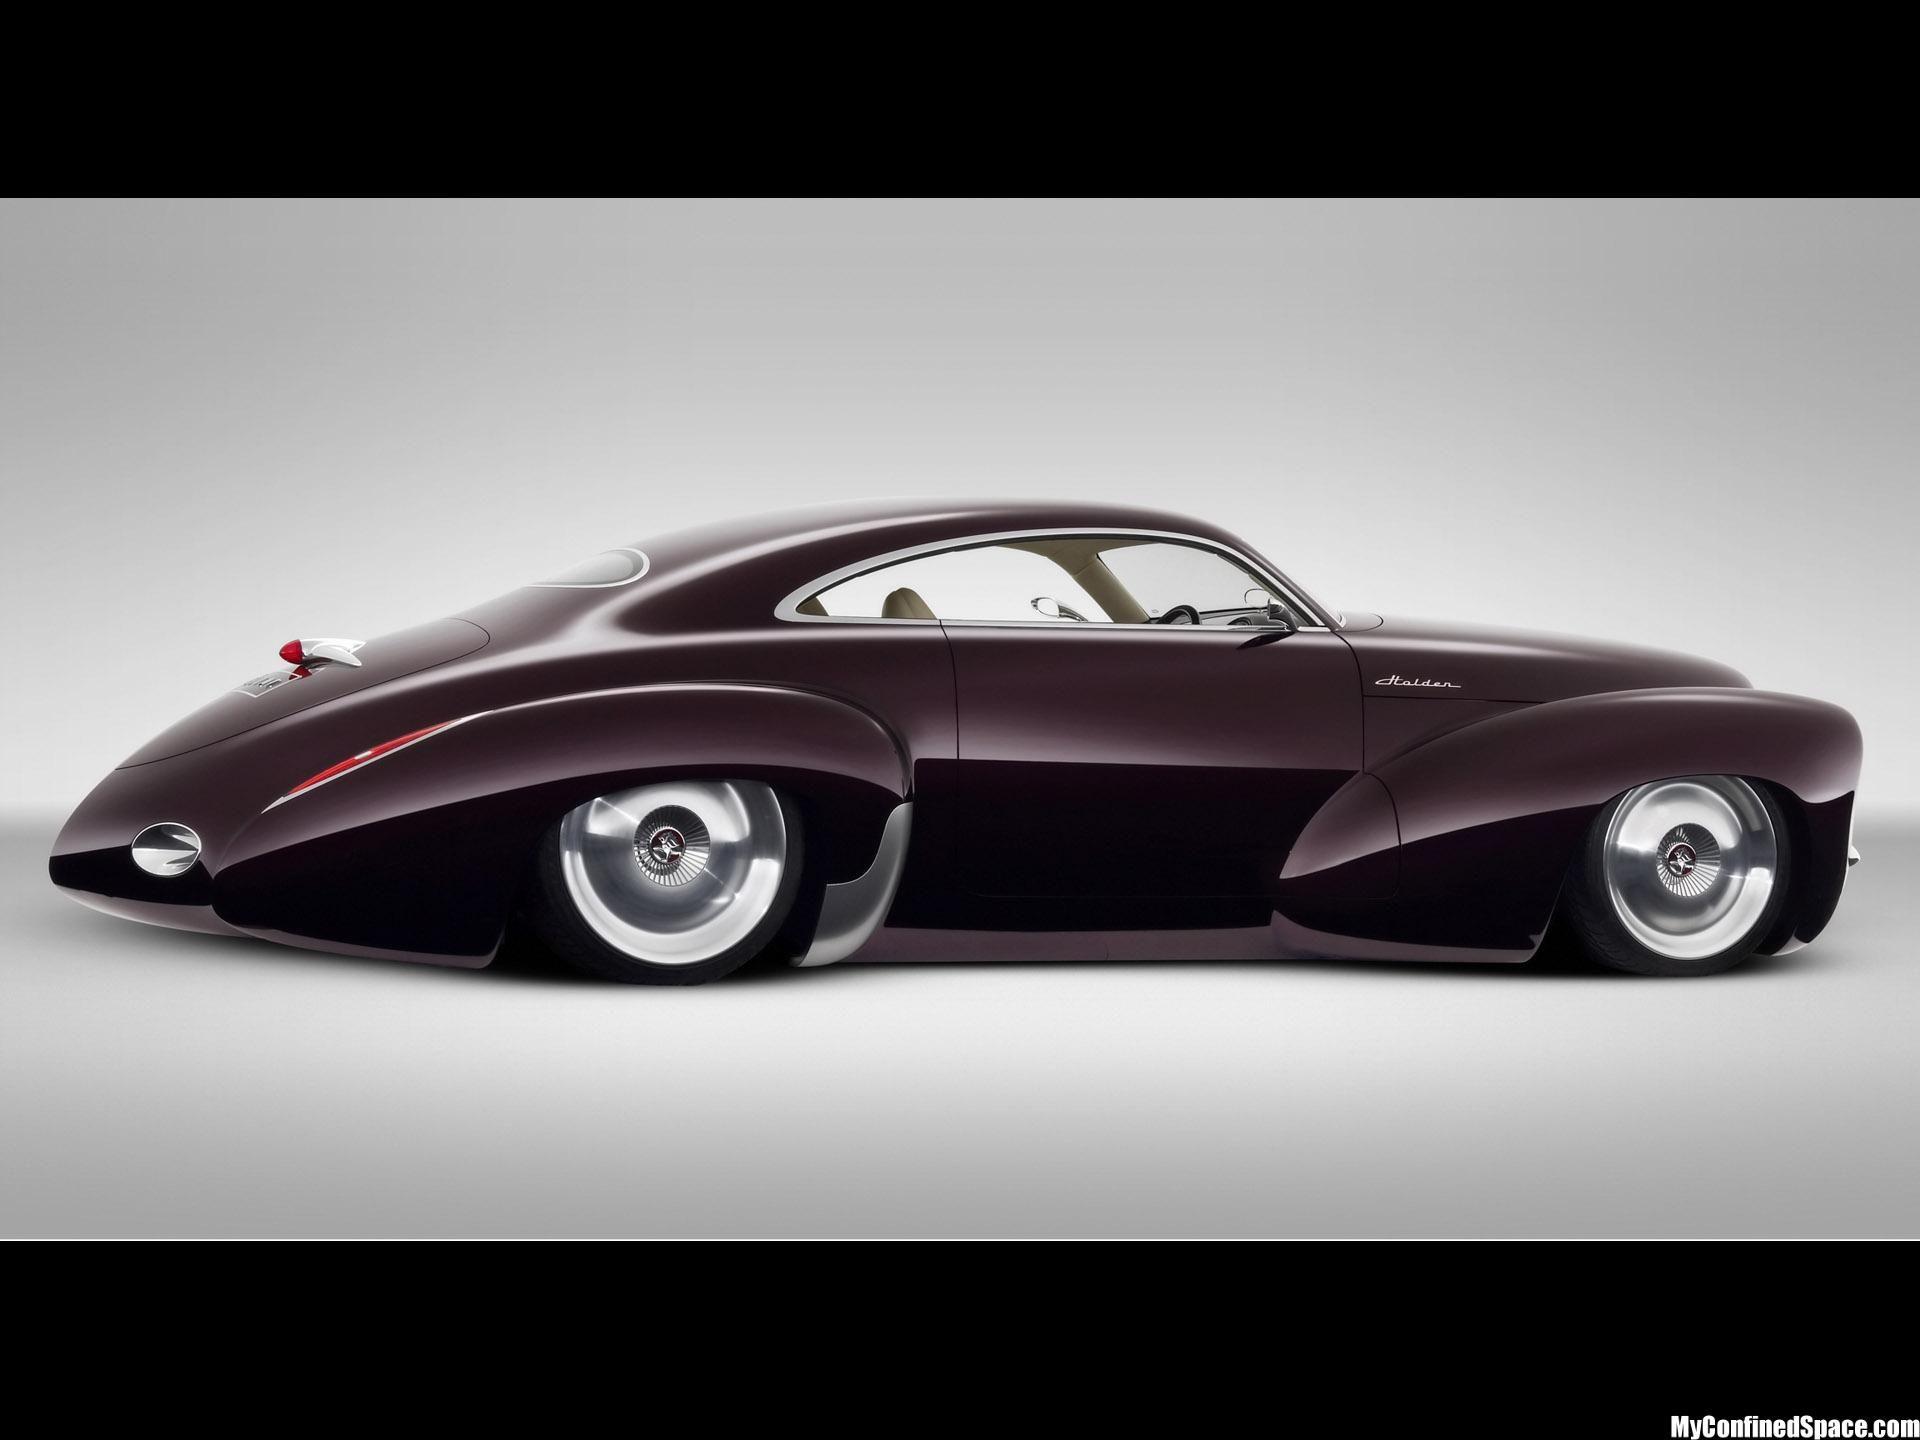 Efijy concept car